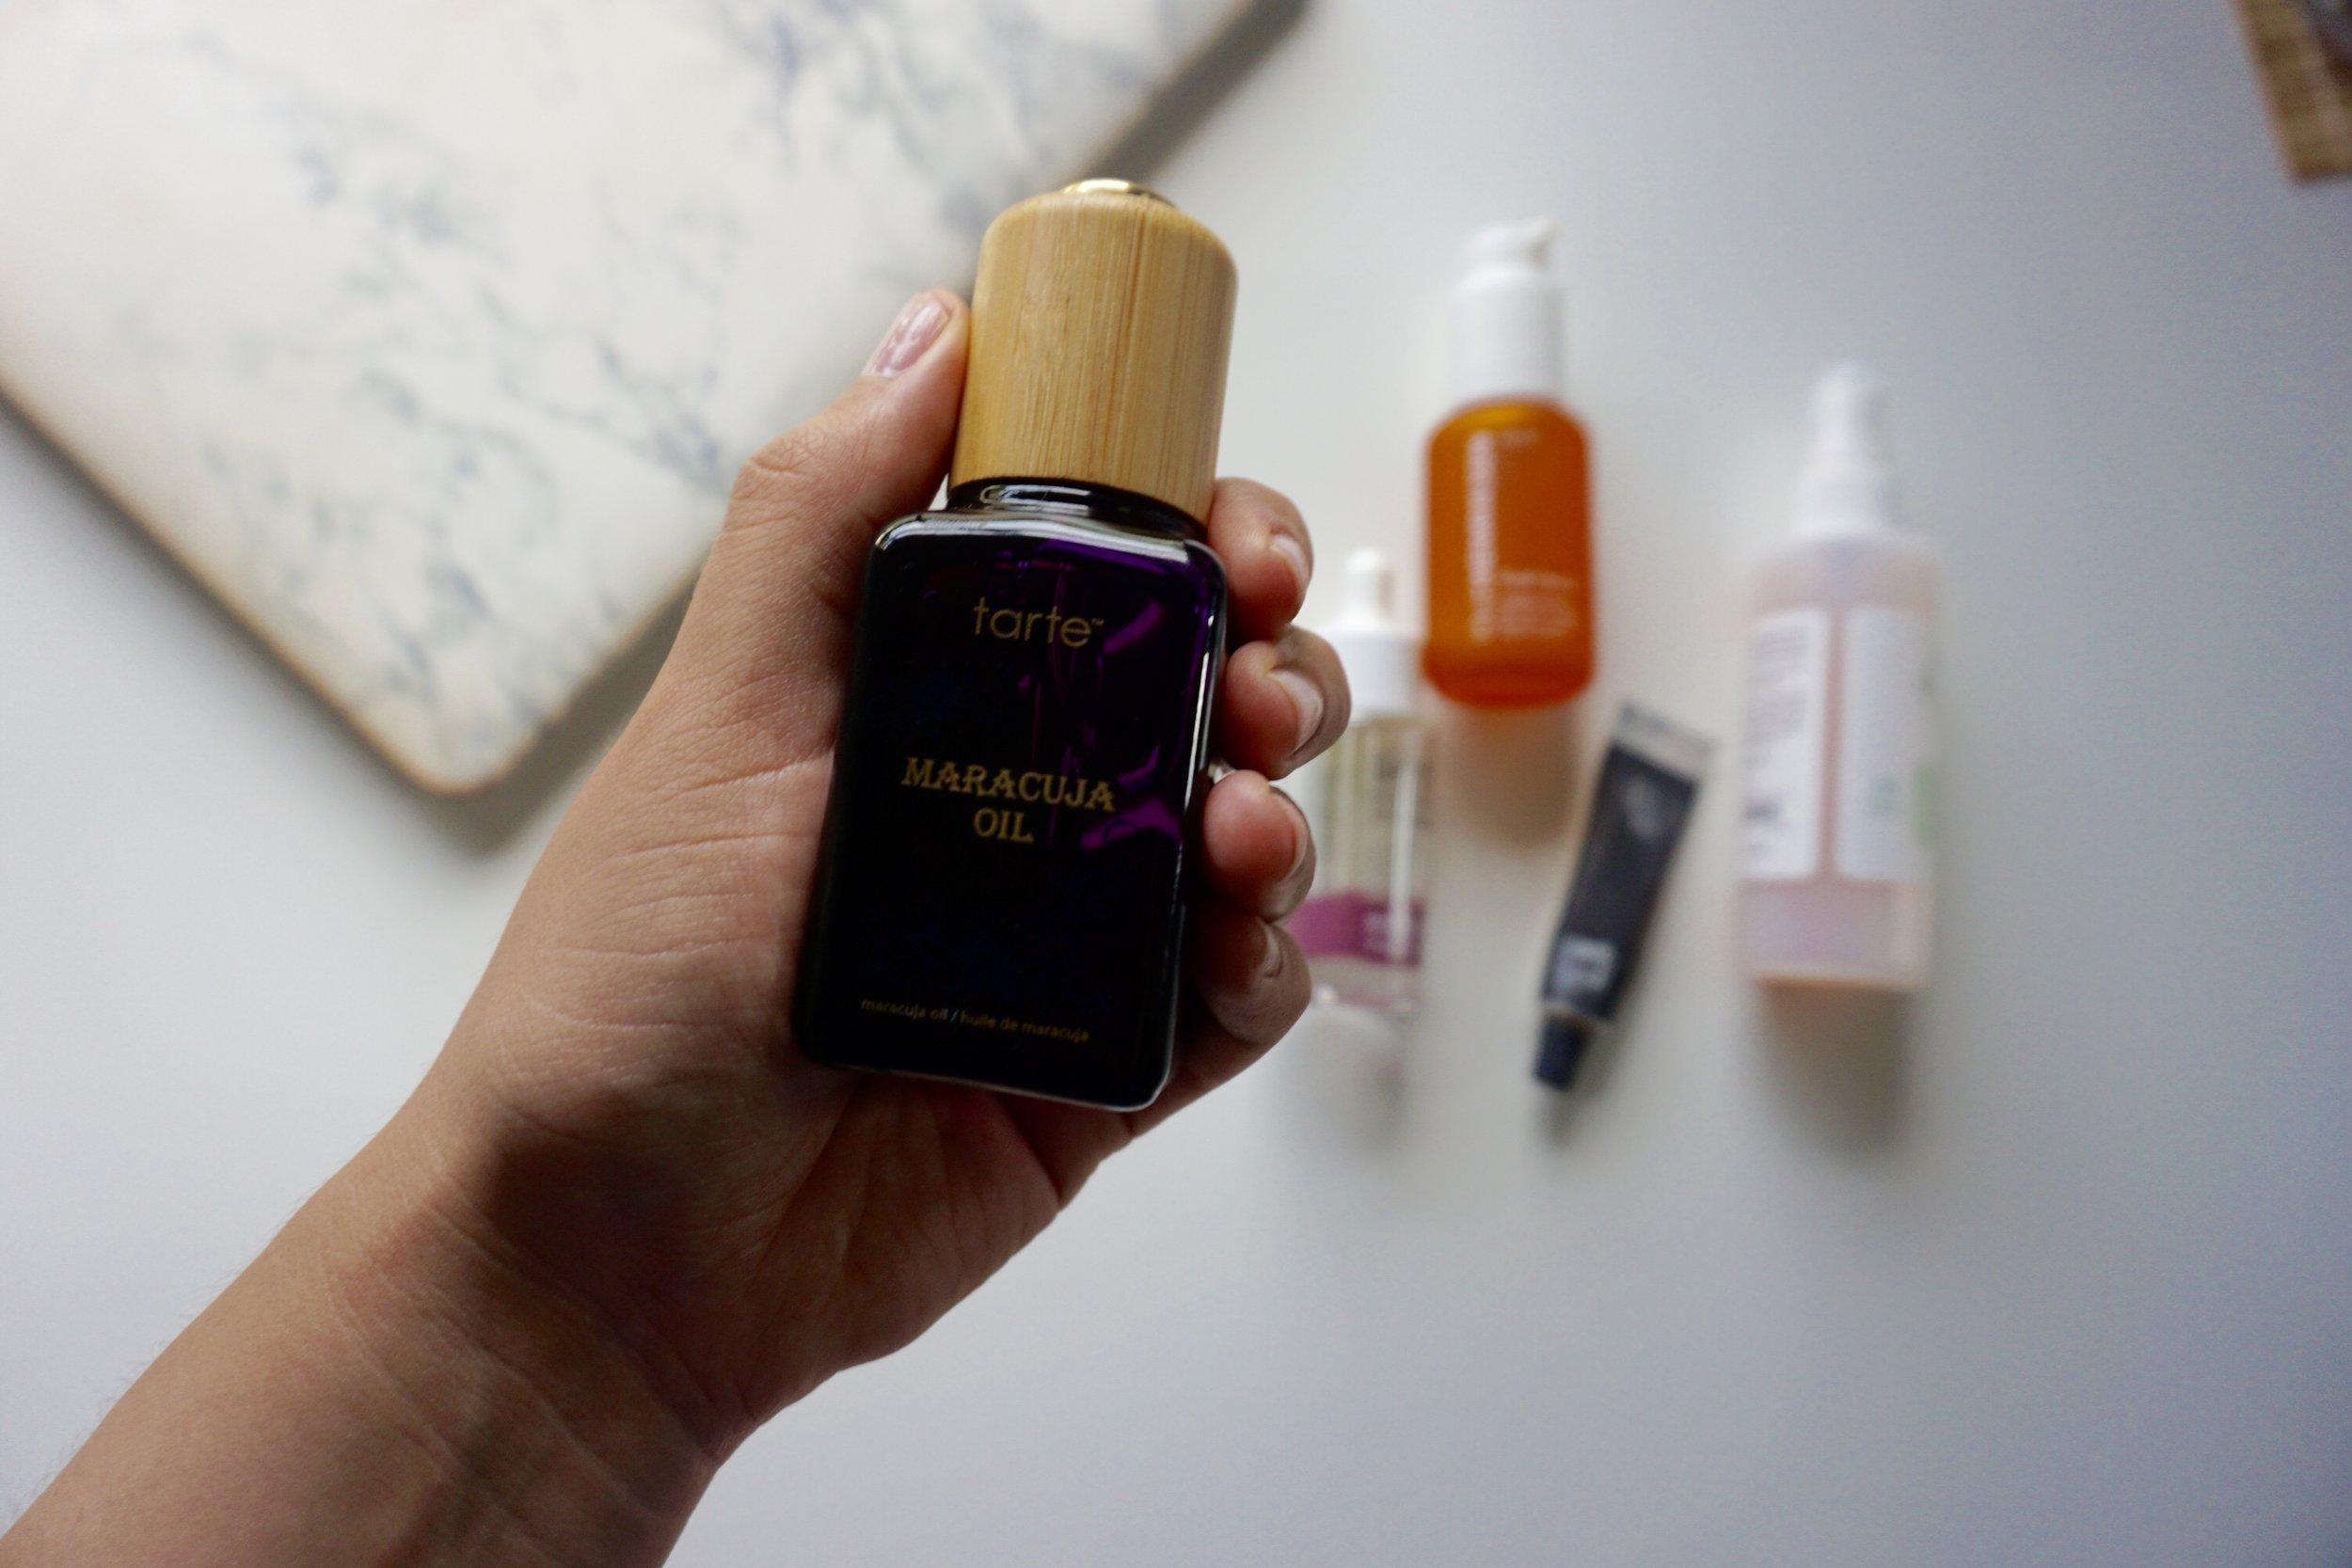 tarte maracuja oil review